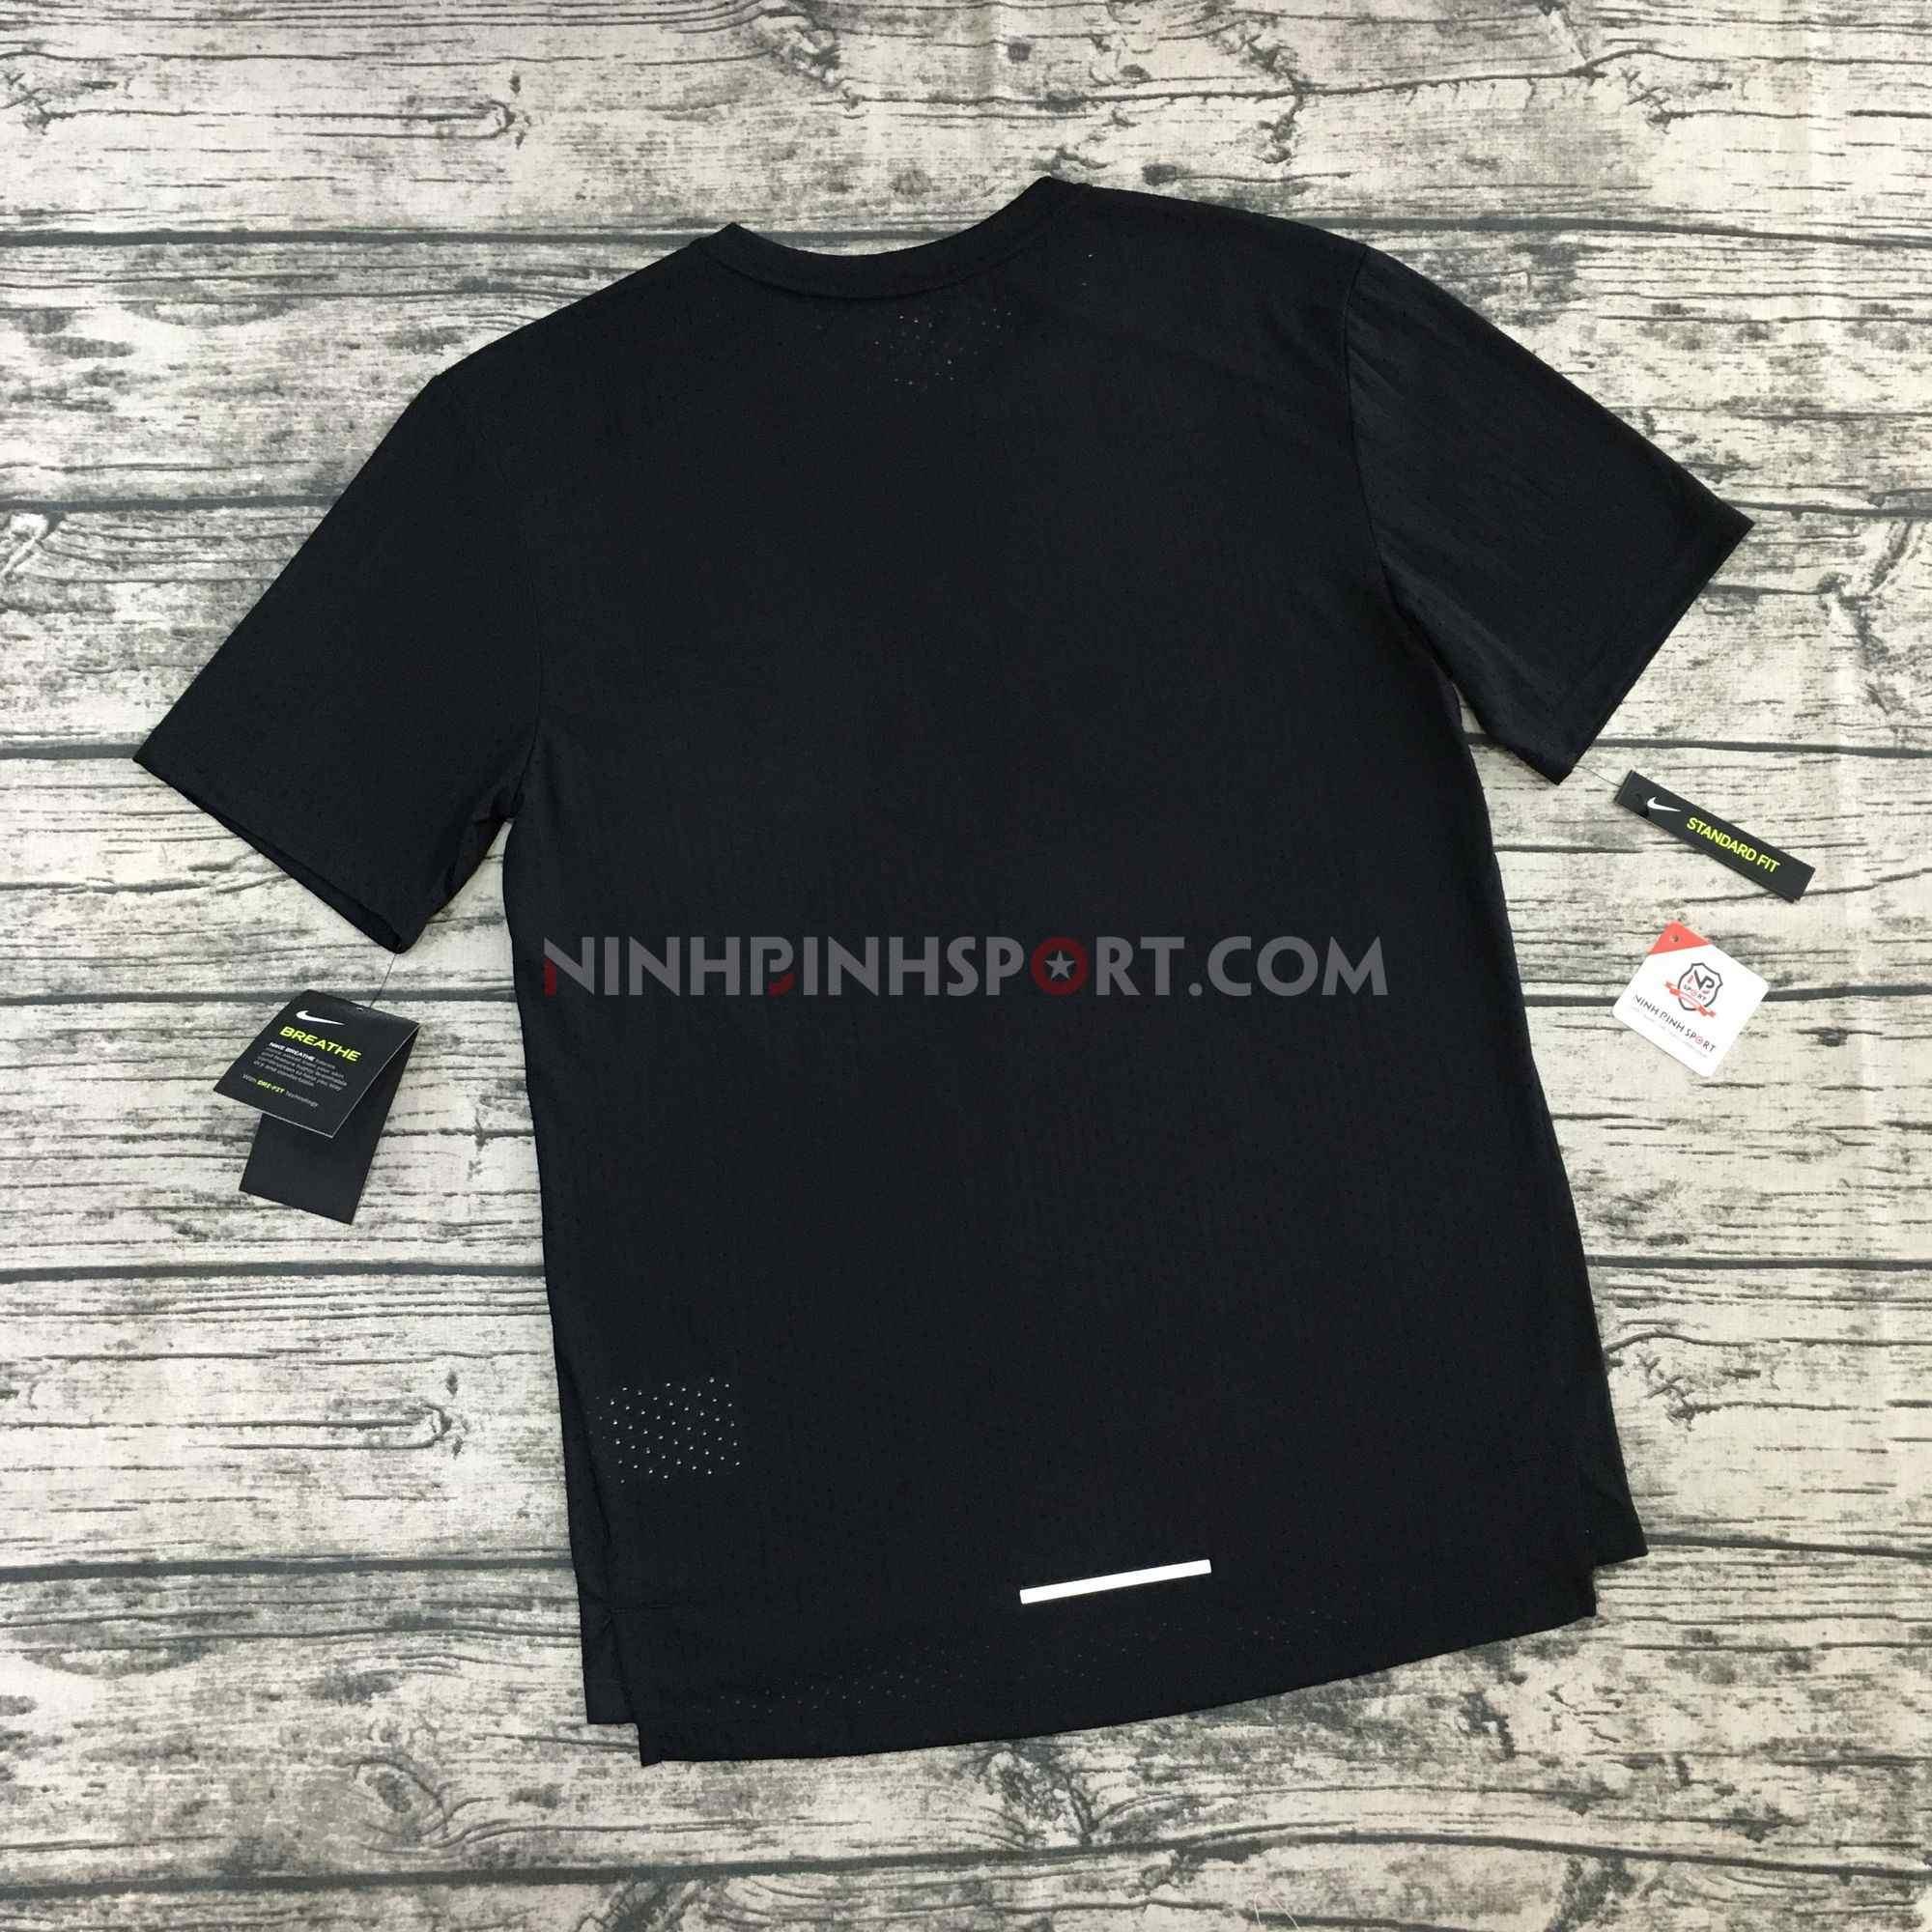 Áo thể thao nam Nike Breathe Rise 365 Black AQ9920-010